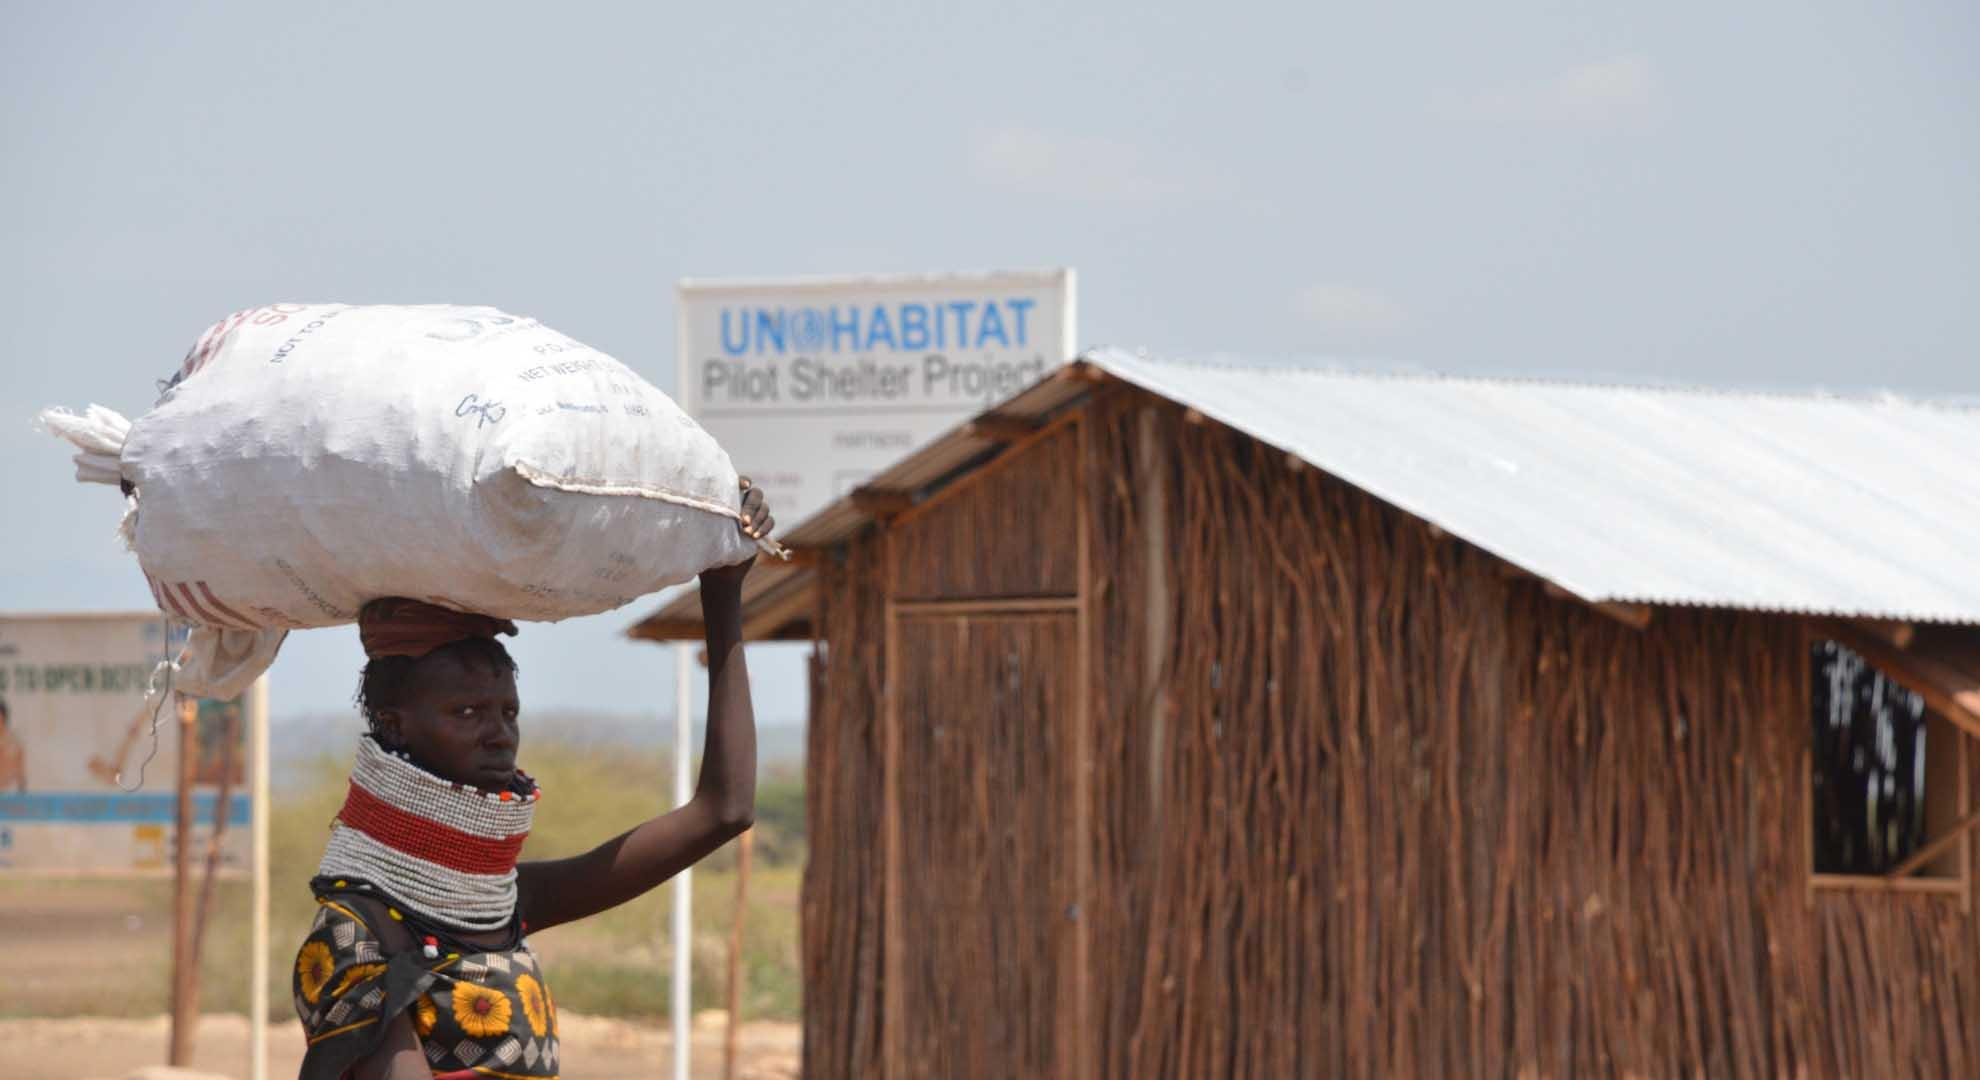 Pilot houses by Shigeru Ban for a new settlement in Kenya.